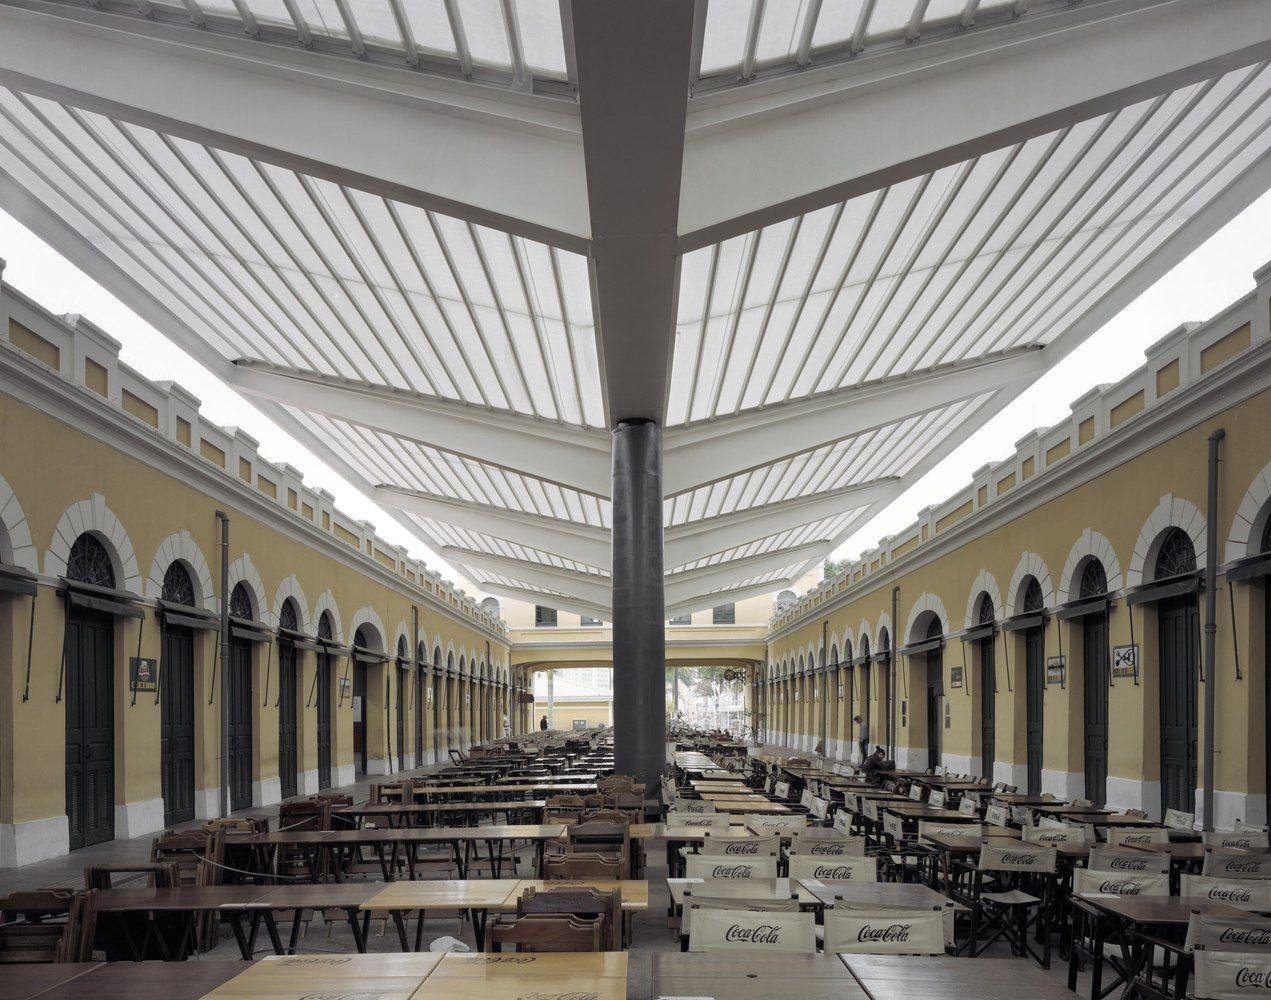 Galeria De Cobertura Mercado Publico De Florianopolis Aleph Zero 8 Roof Architecture Affordable Roofing Fibreglass Roof